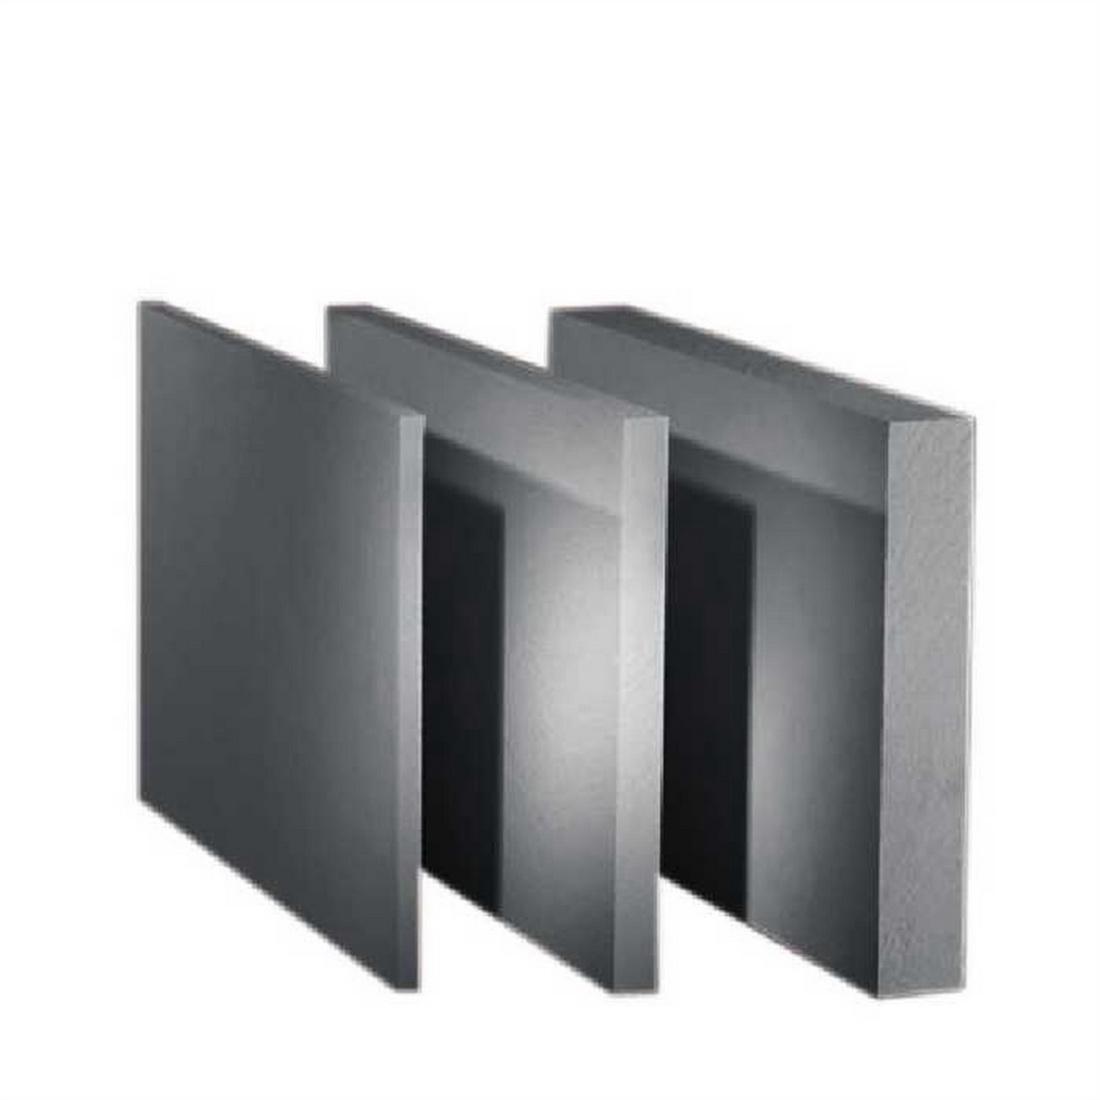 Expol Platinum Board 2400 x 1200 x 55mm R1.72 Black Expanded Polystyrene N2455